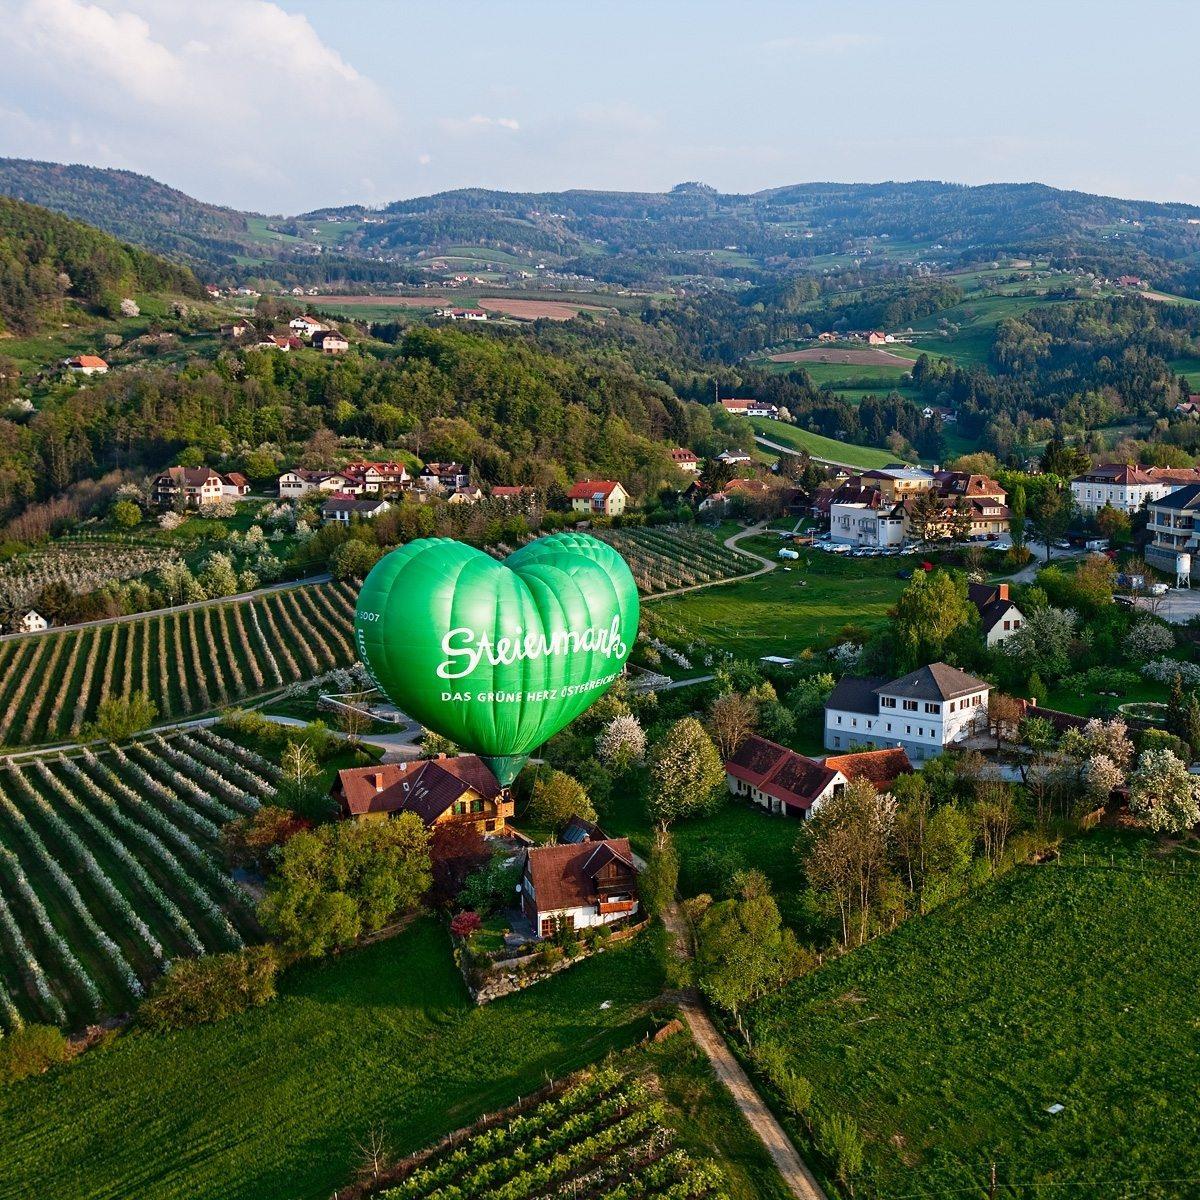 Ballonfahrt für zwei inkl. 2 Übernachtungen (Mo-Do) - Raum Braunau am Inn